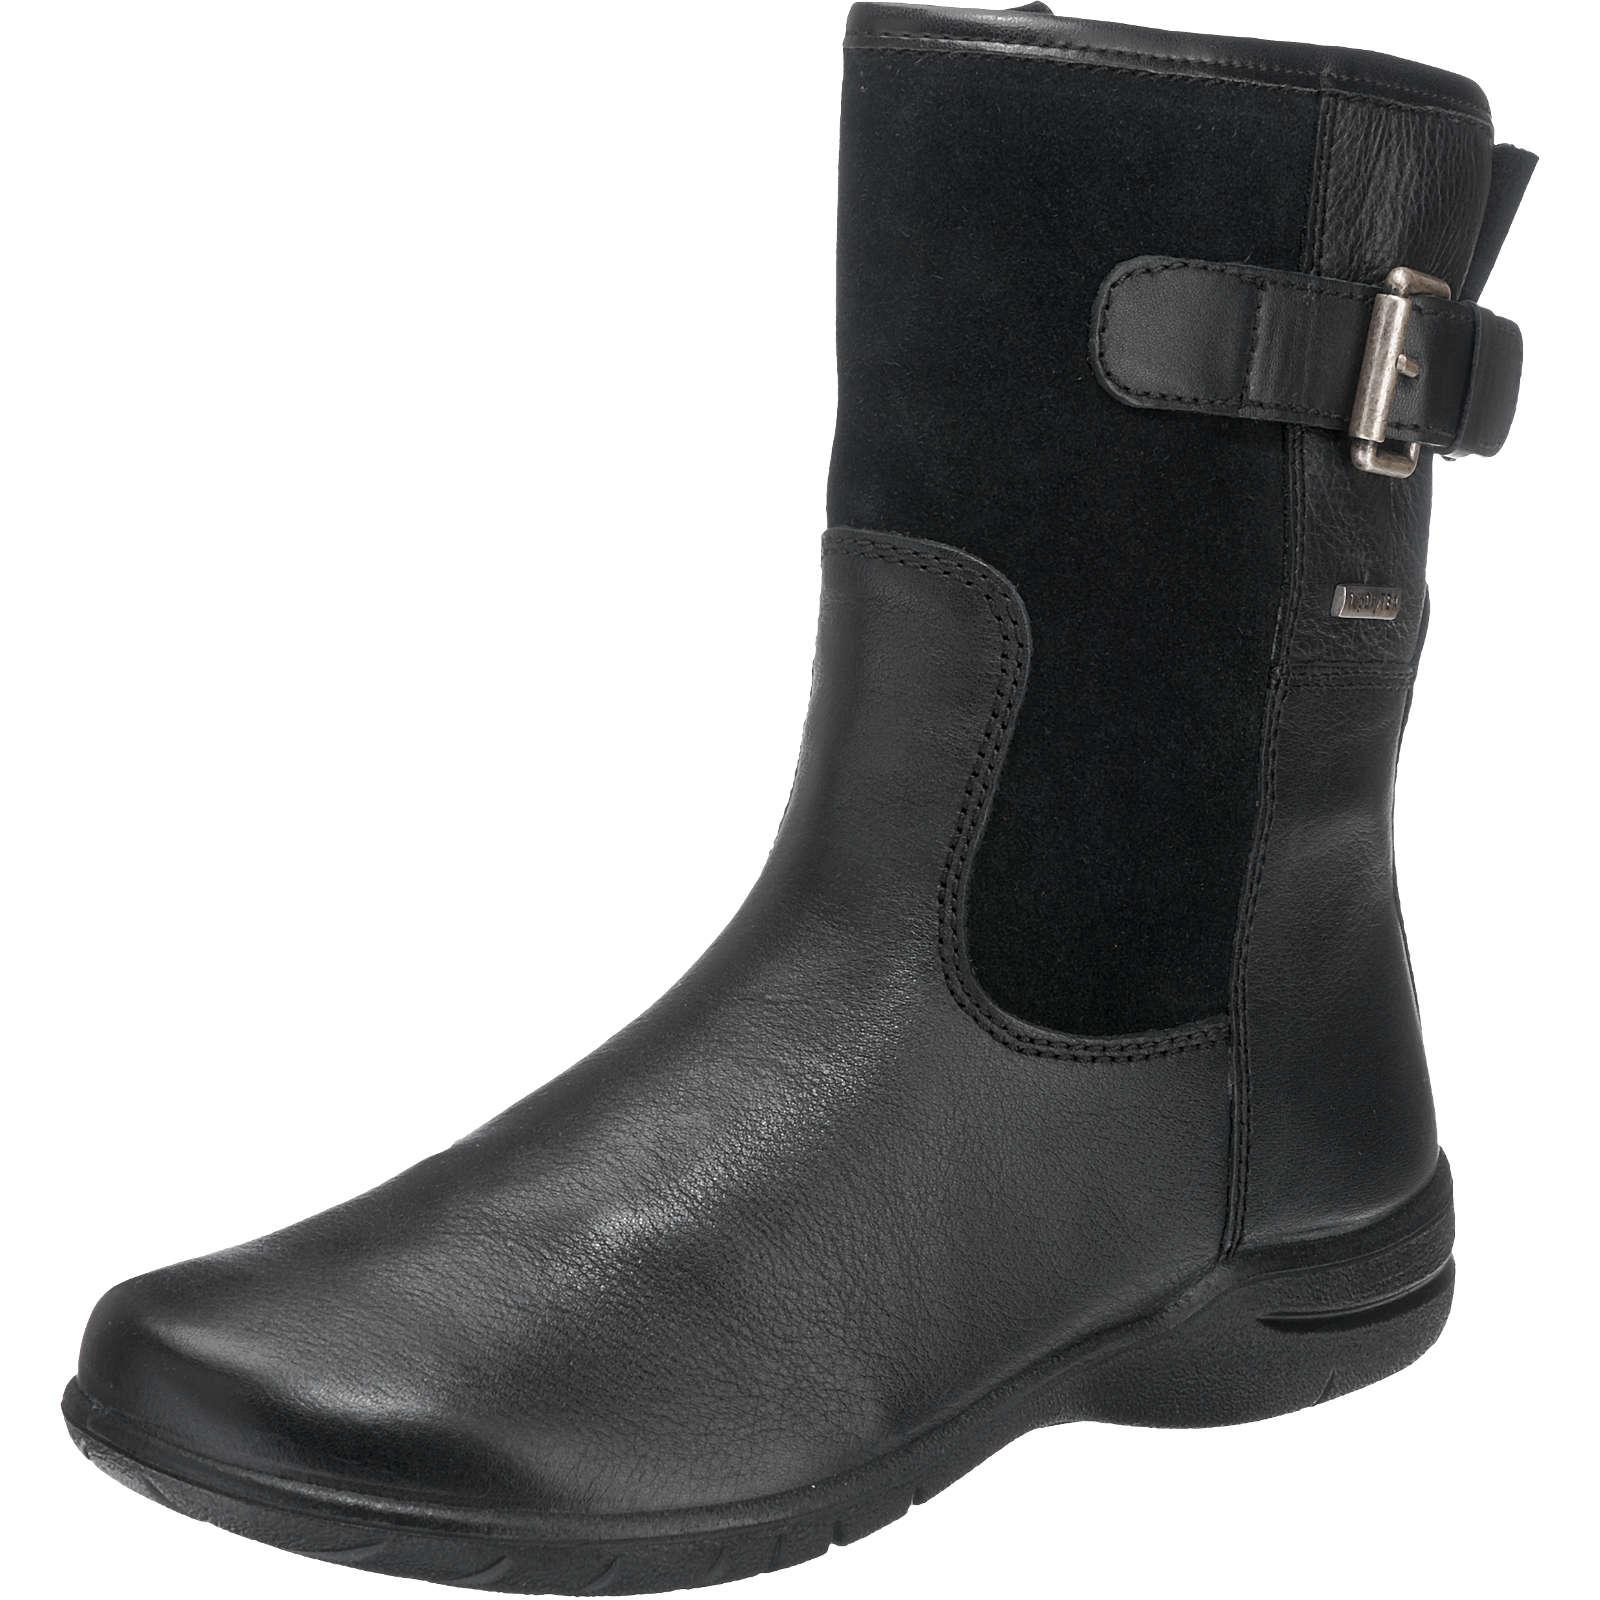 Josef Seibel Fabienne 45 Klassische Stiefel schwarz Damen Gr. 36